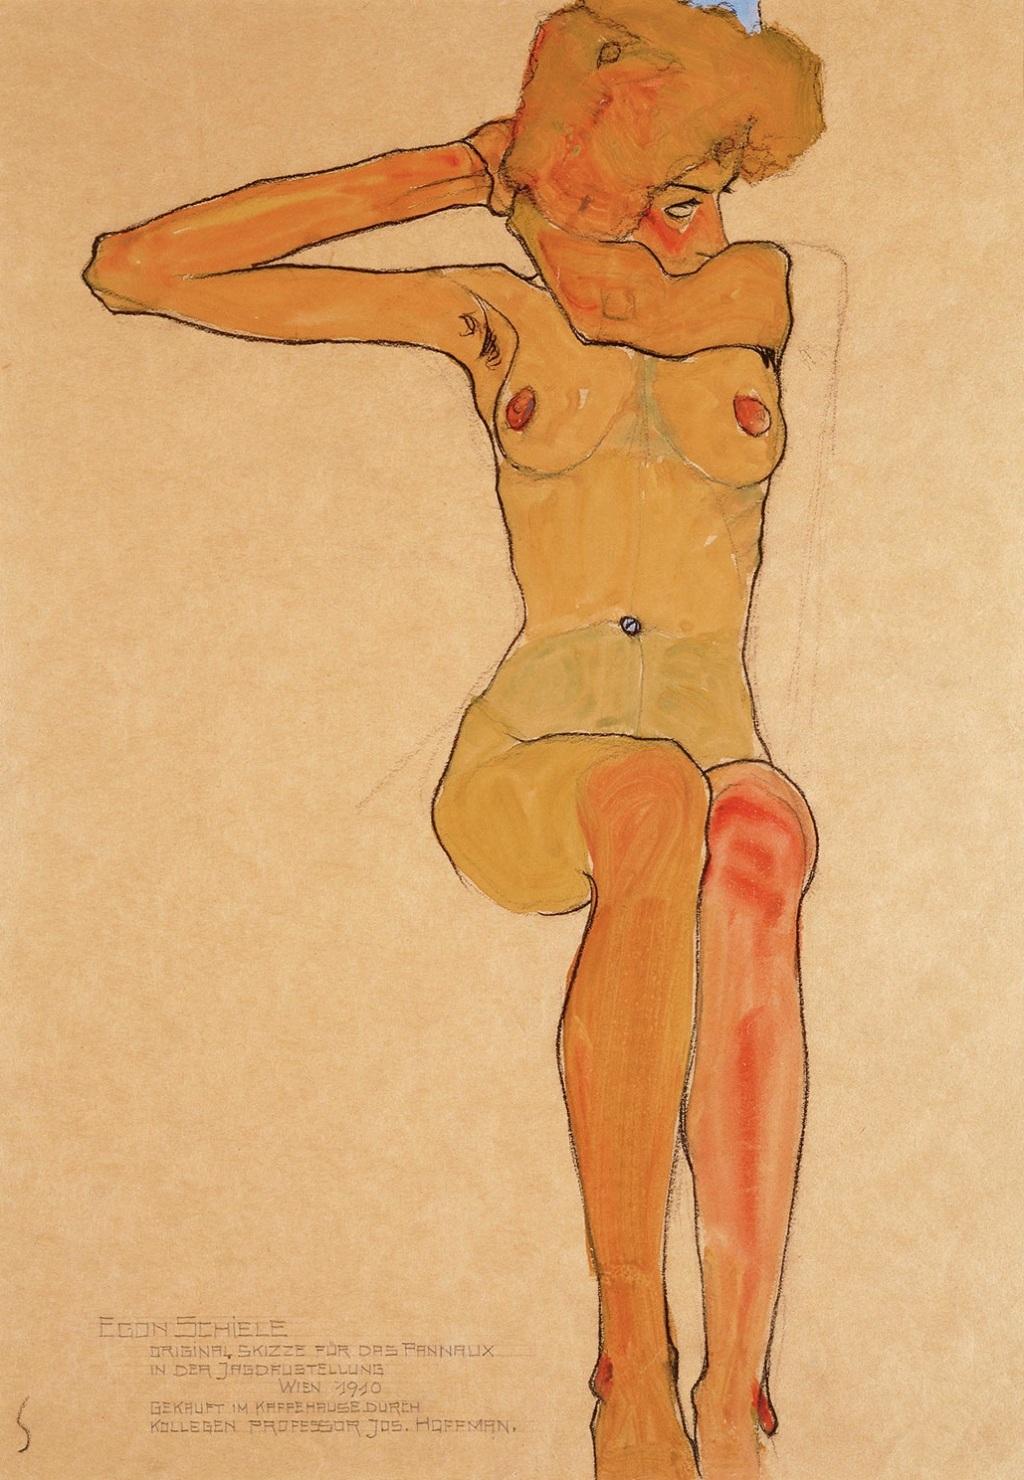 Seated Female Nude with Raised Arm (Gertrude Schiele), 1910